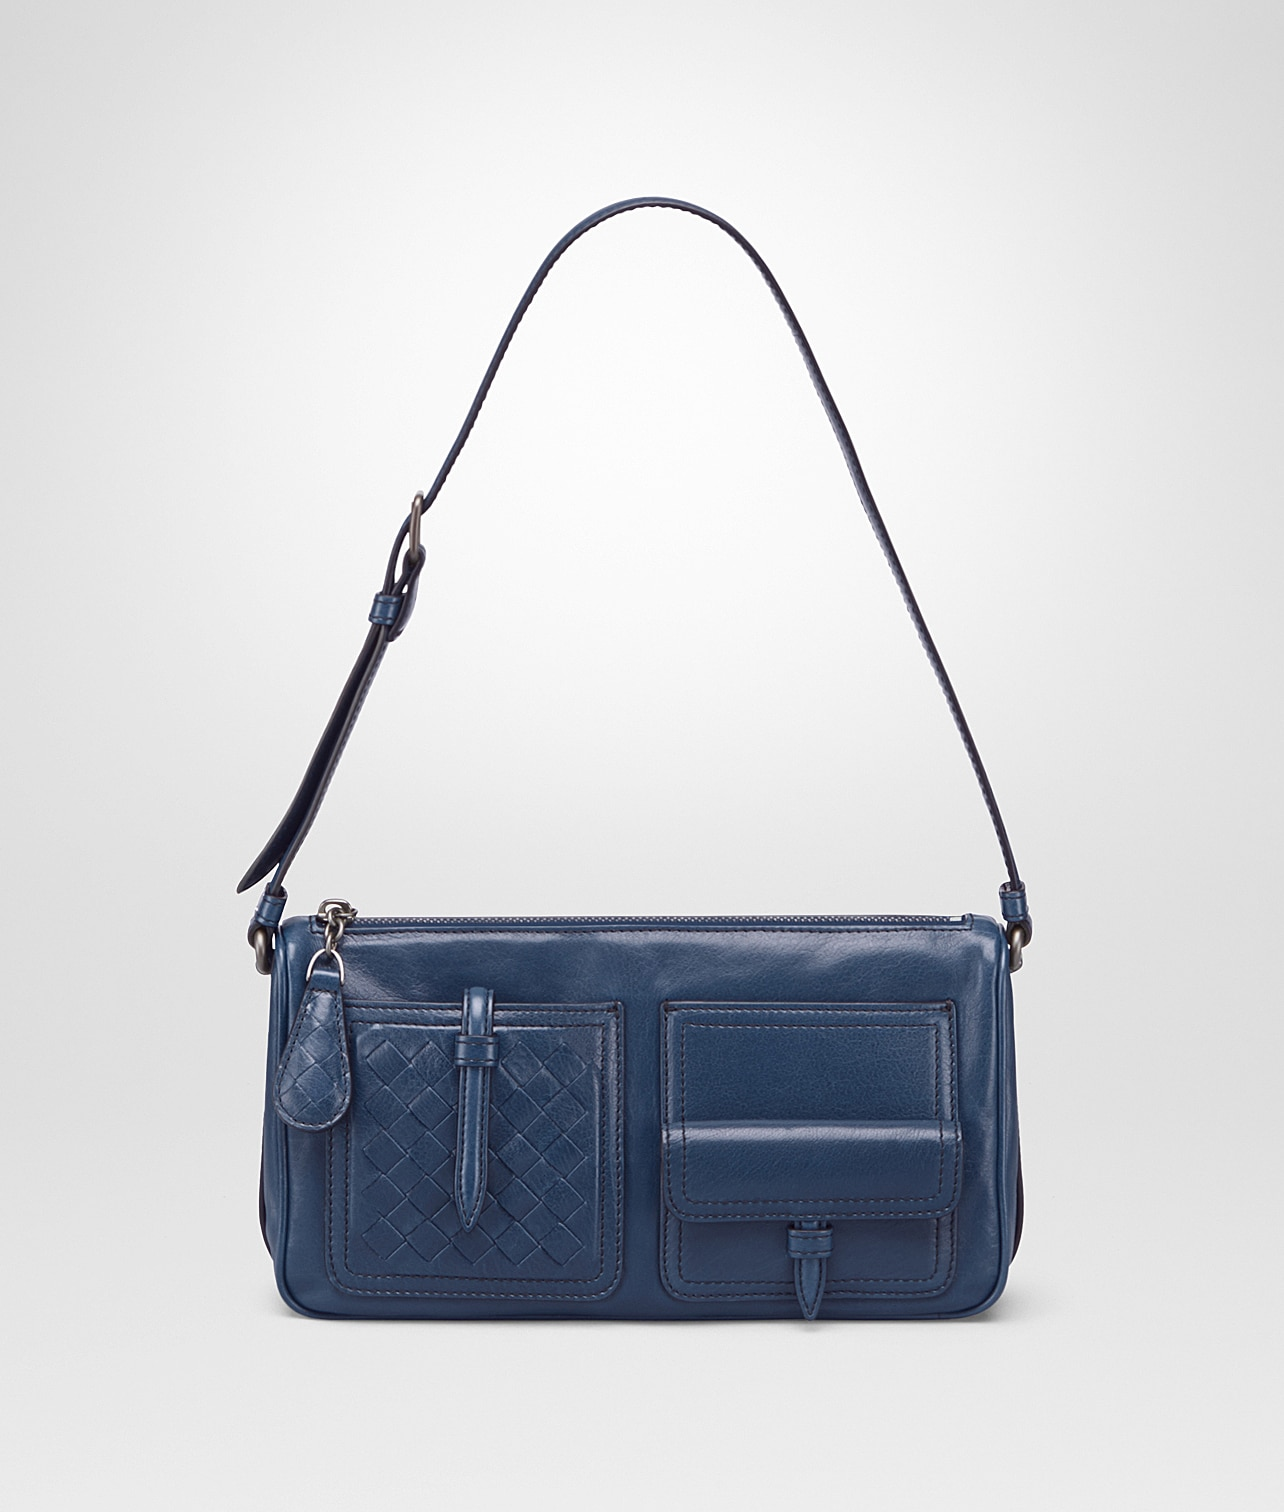 b4bfa777aec3 Bottega Veneta Pacific Calf Leather with Intrecciato Shoulder Bag